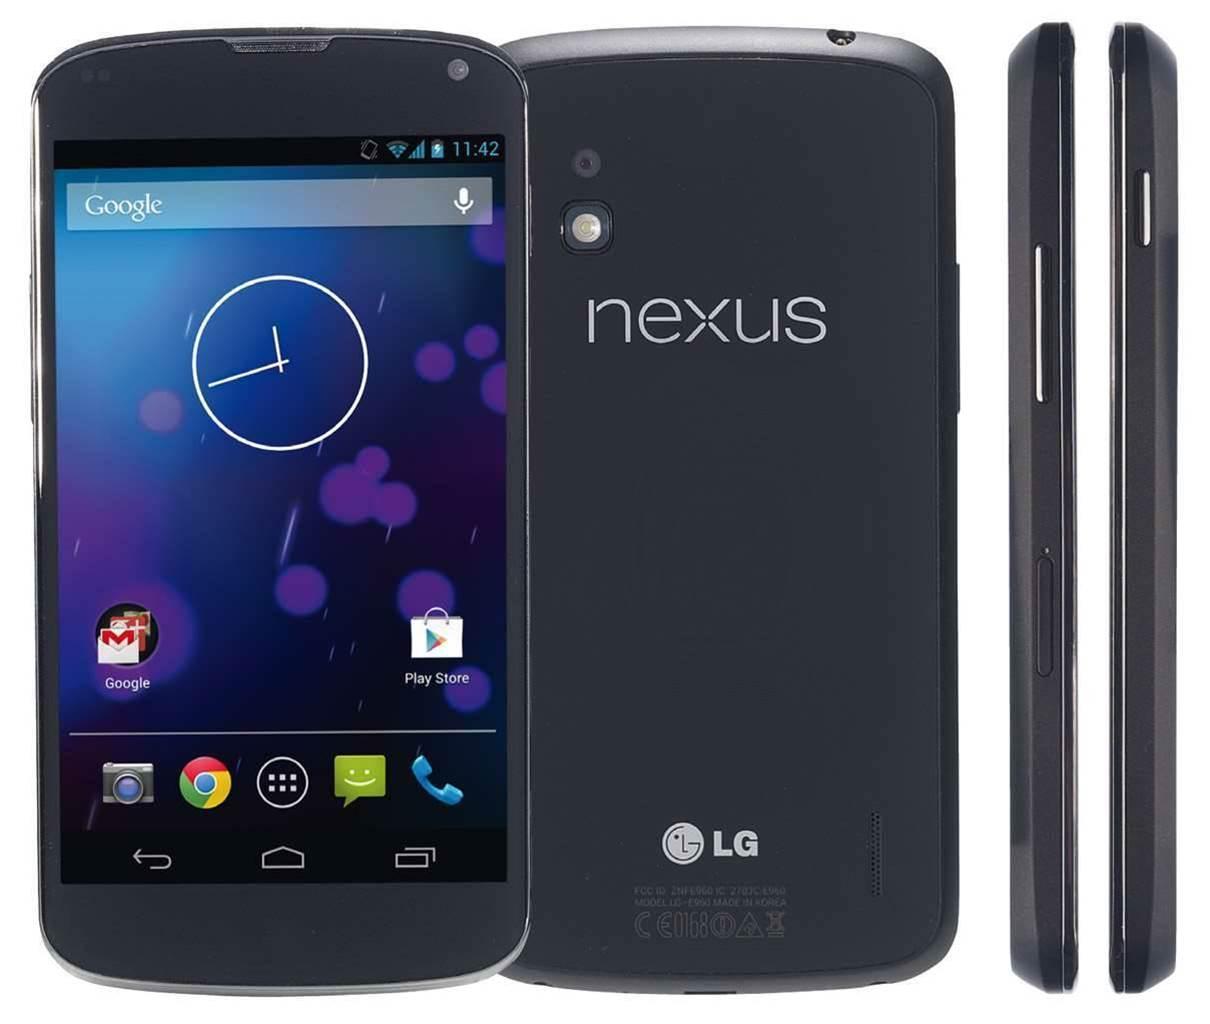 Review: Nexus 4